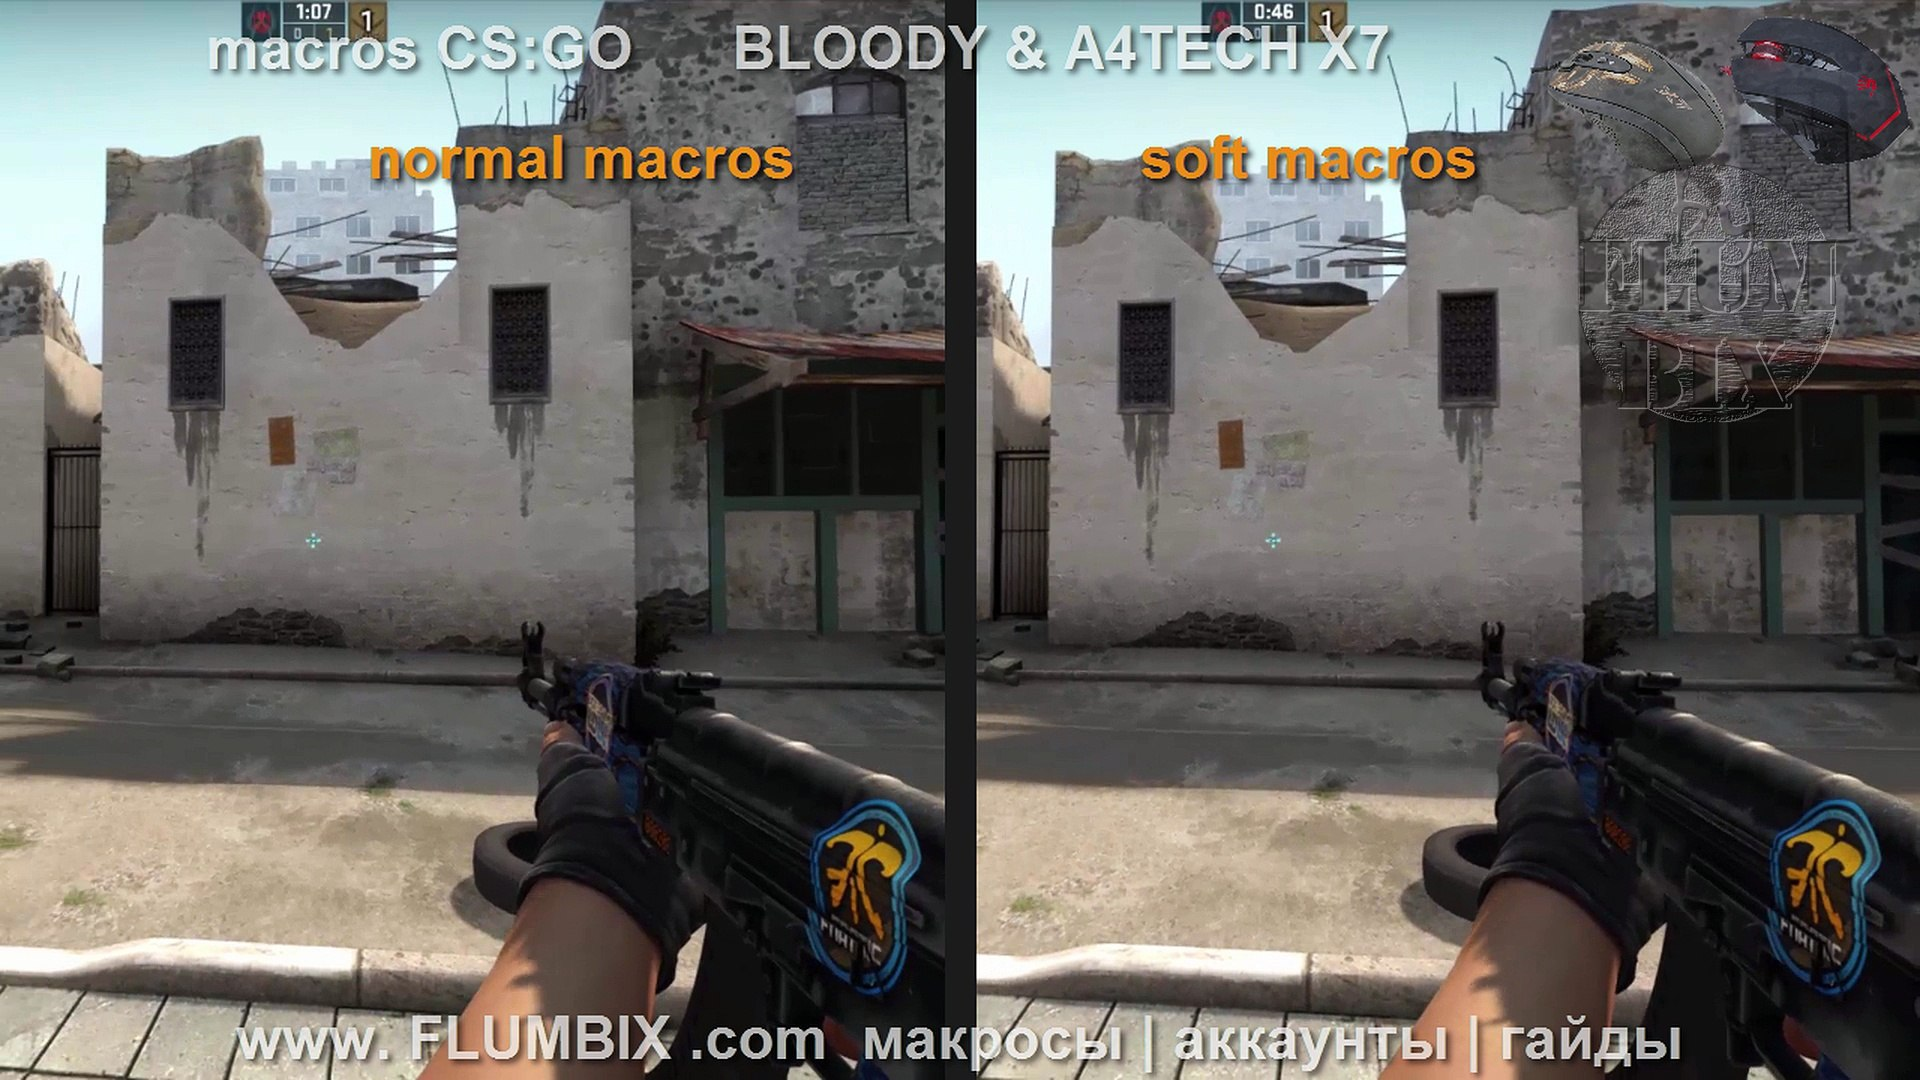 Bloody X7 soft vibration macros no recoil   CS:GO Bloody X7 мягкий макрос  без отдачи